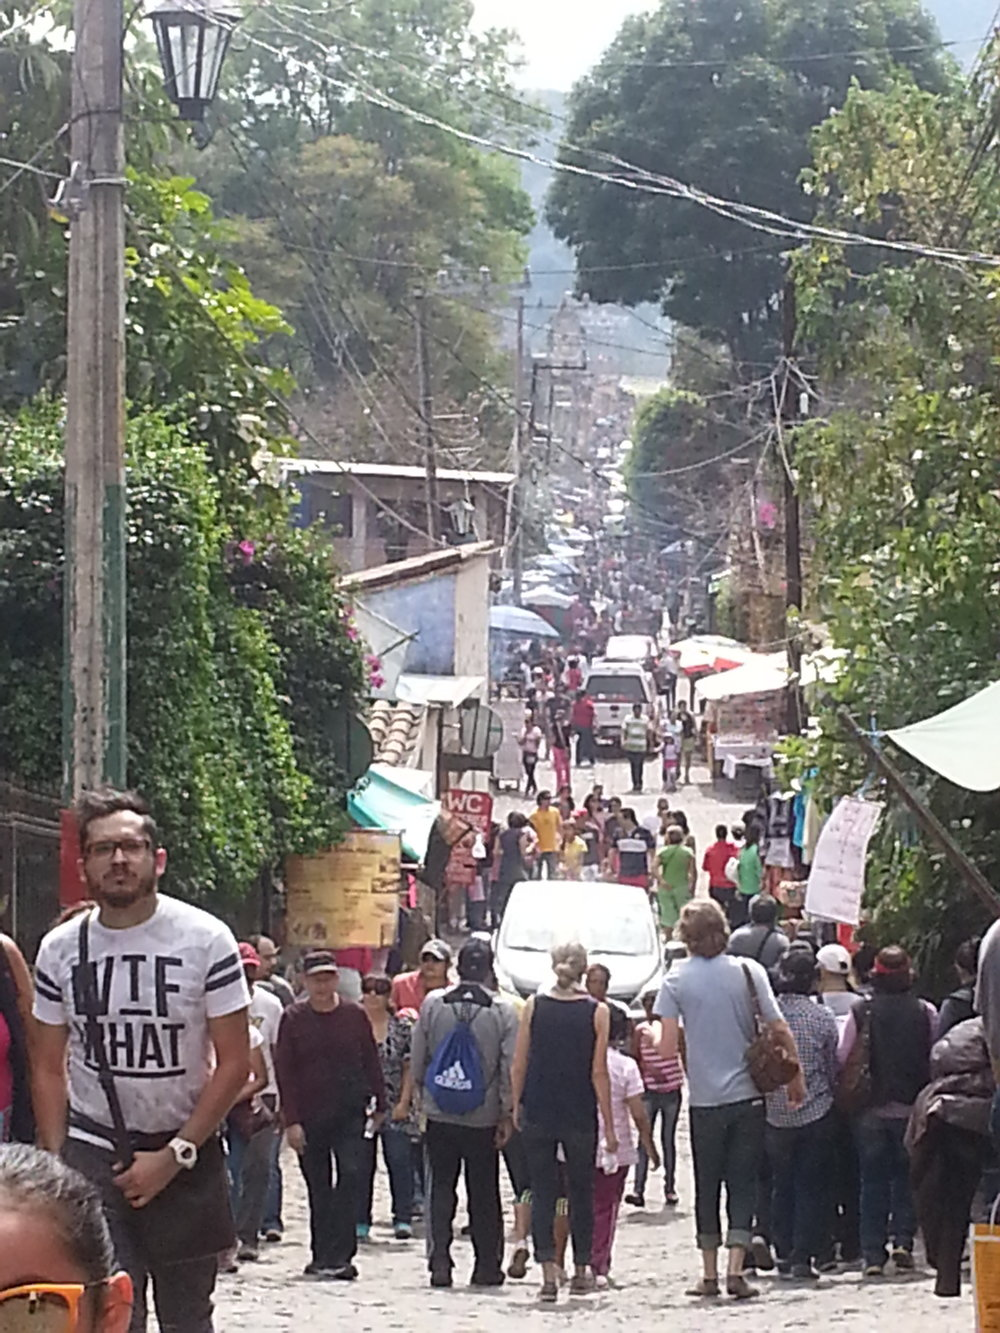 20150201_131953 Tepoz busy street.jpg